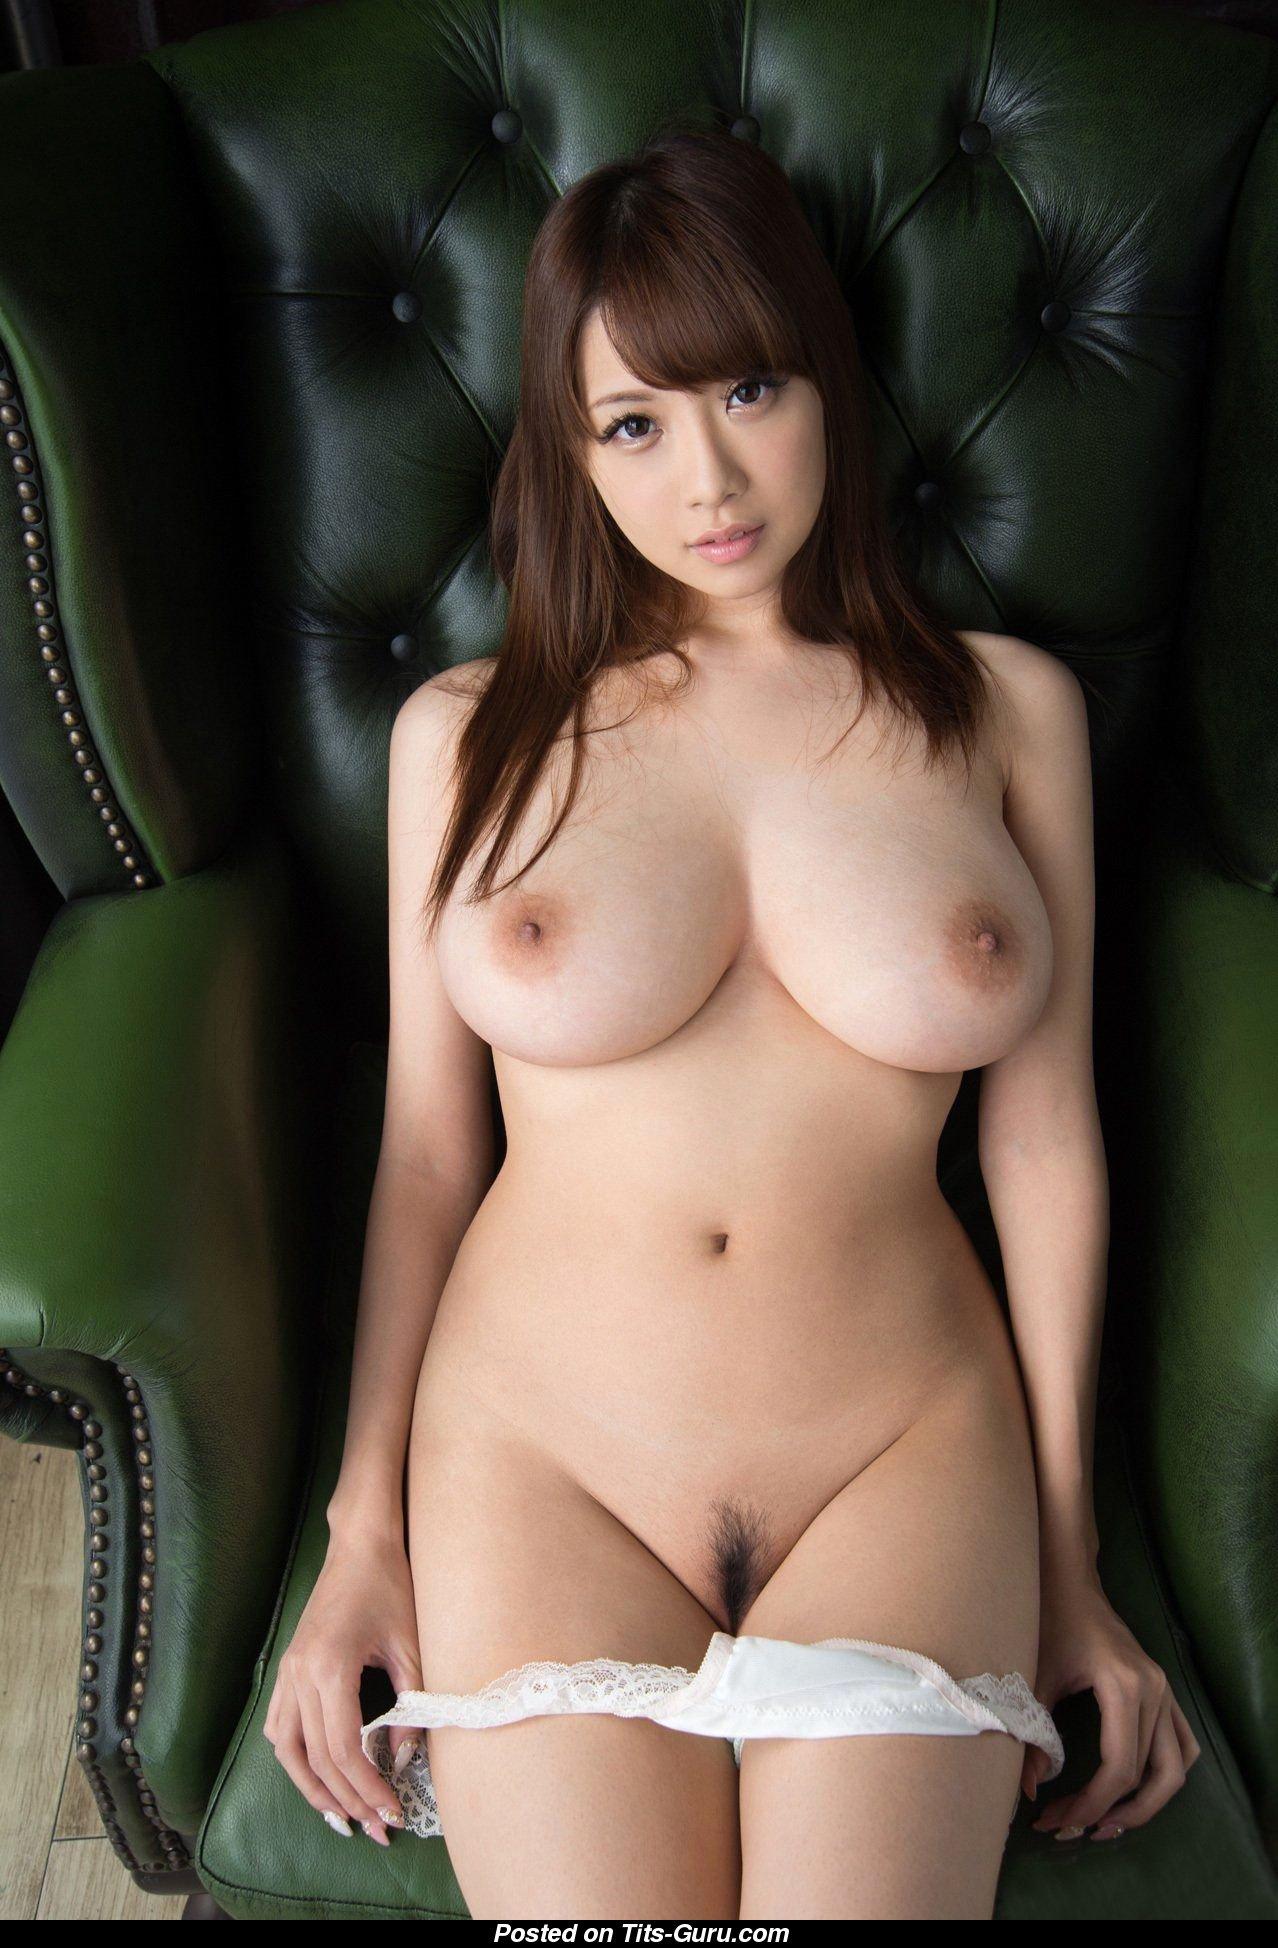 Austrian Girls Nude - Hot Girls Pussy-3464